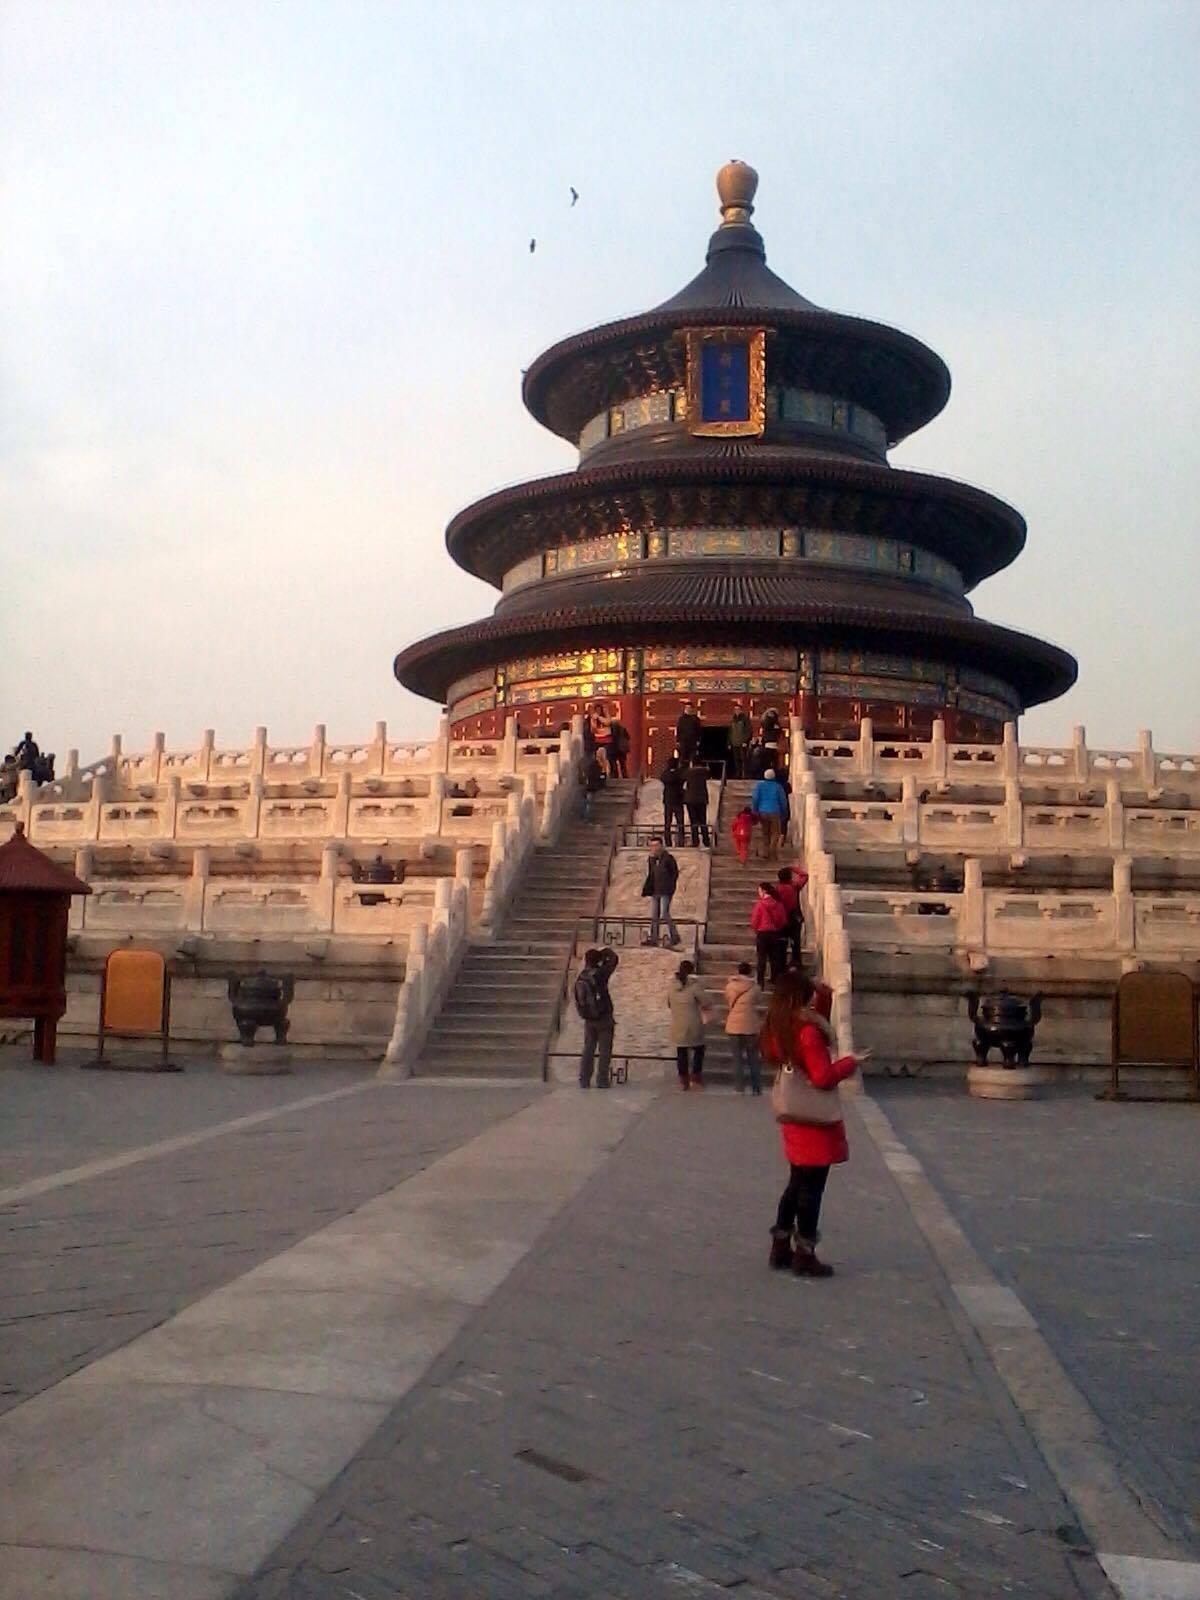 "<img src=""tempio del Paradiso.jpg"" alt=""Tempio del Paradiso a Pechino"" srcset="